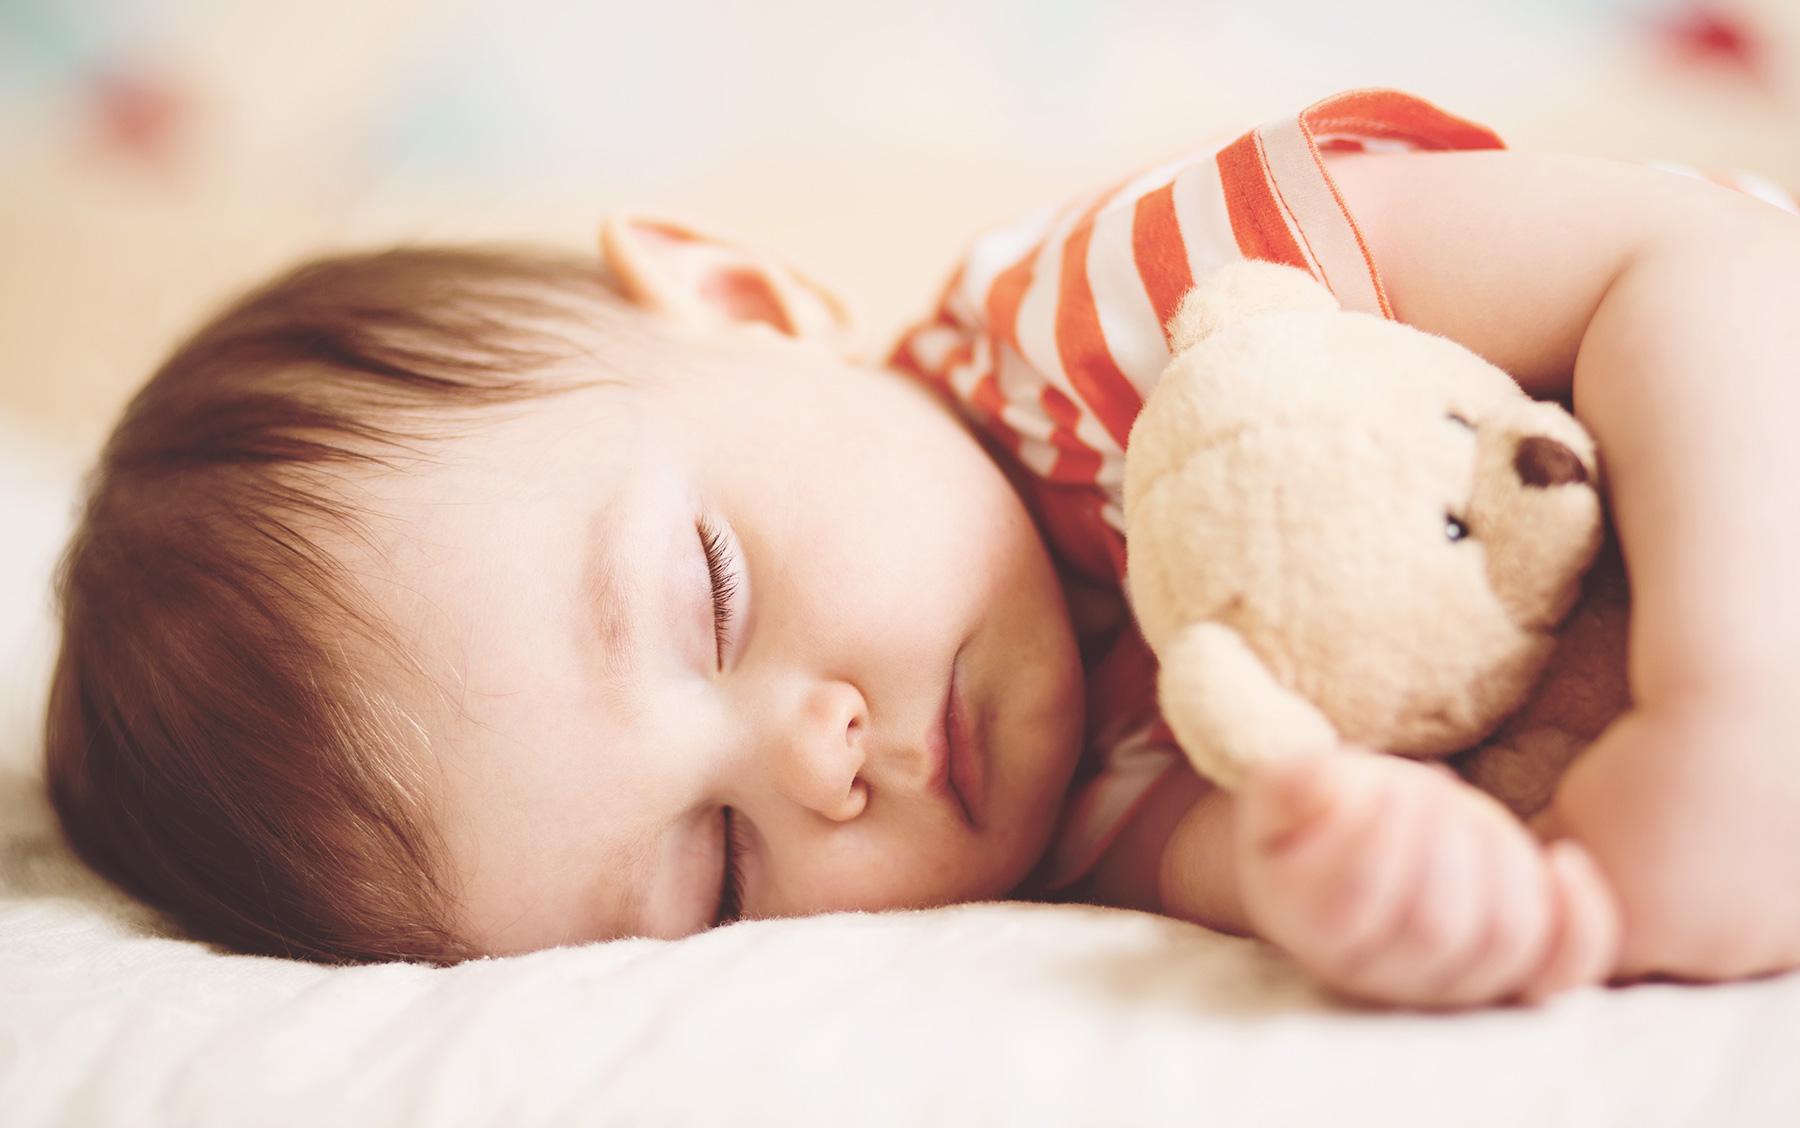 Baby crib mattress best - Baby Crib Mattress Best 33